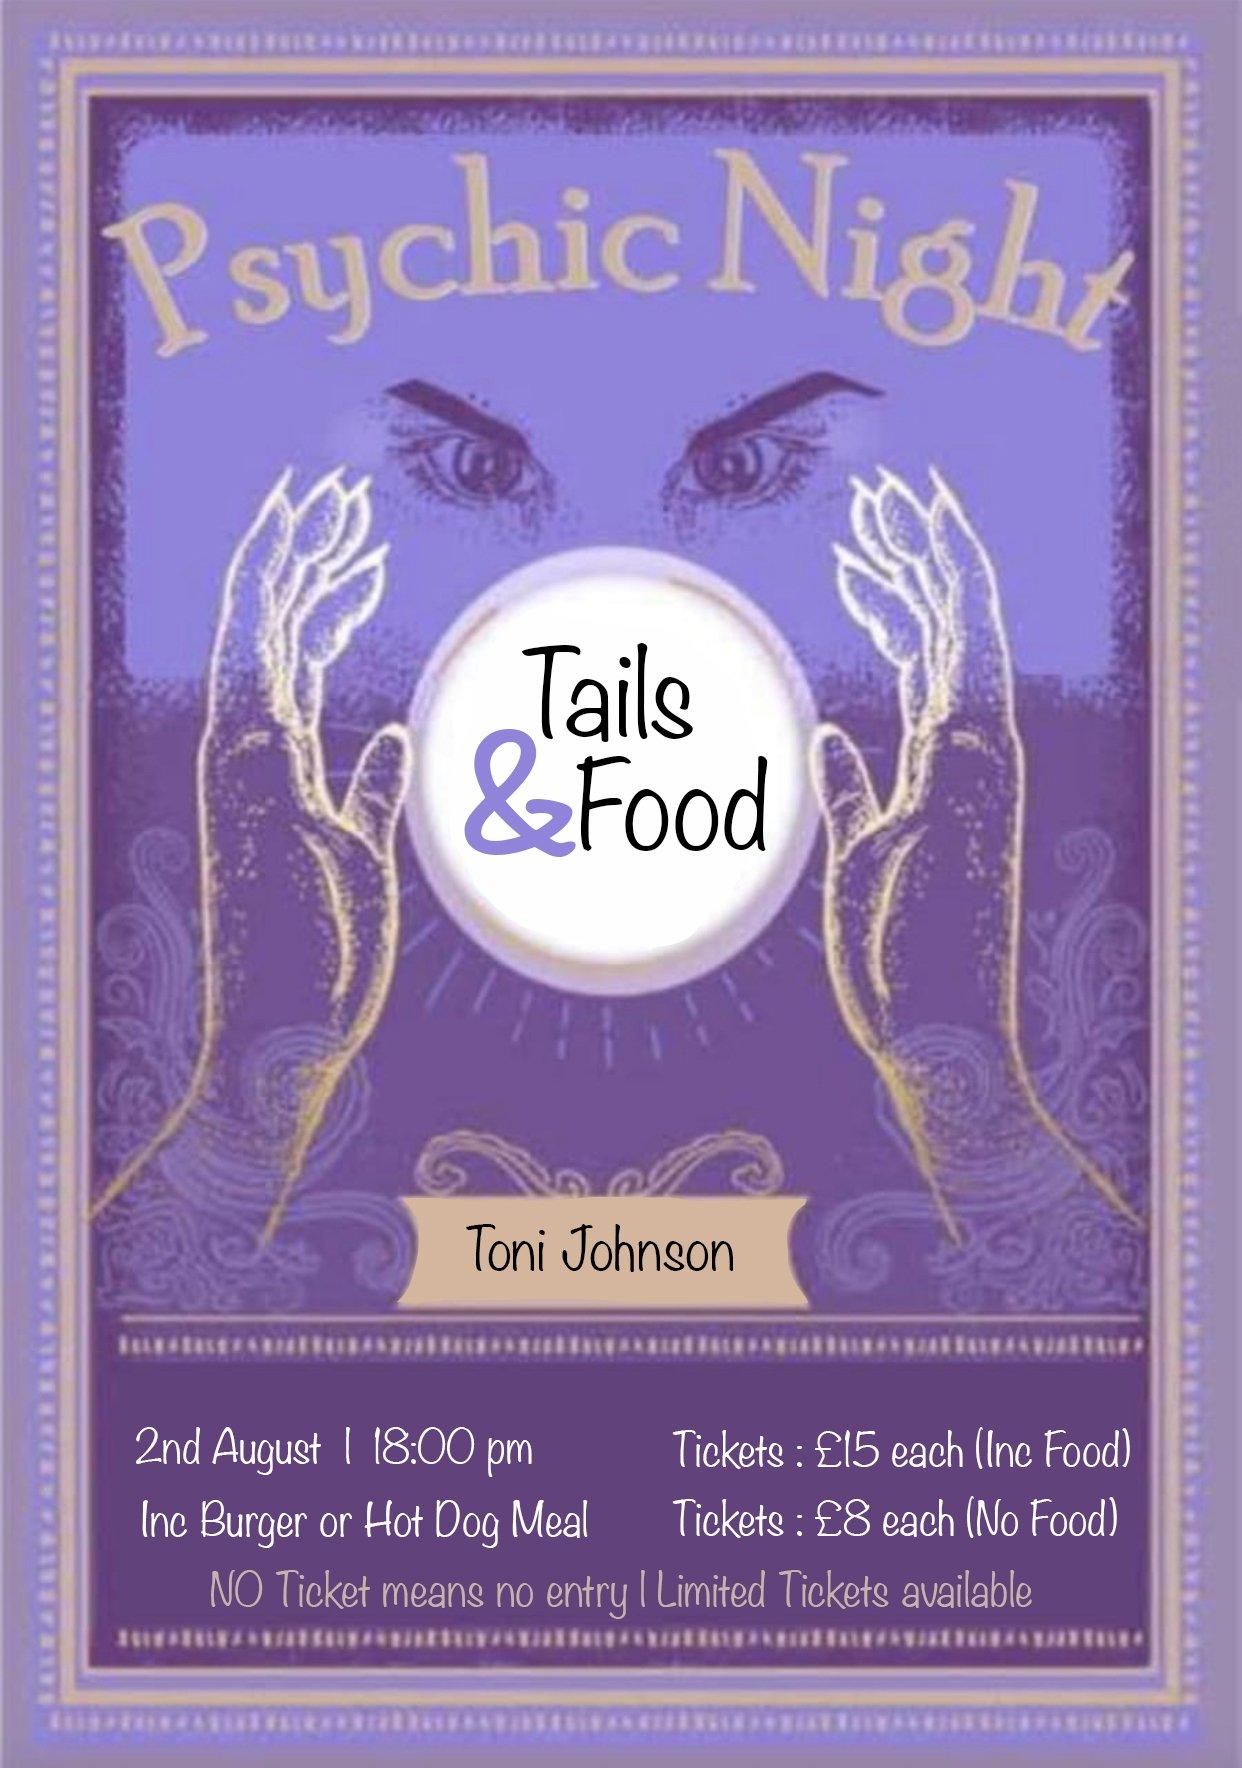 Psychic Night - Tails & Food